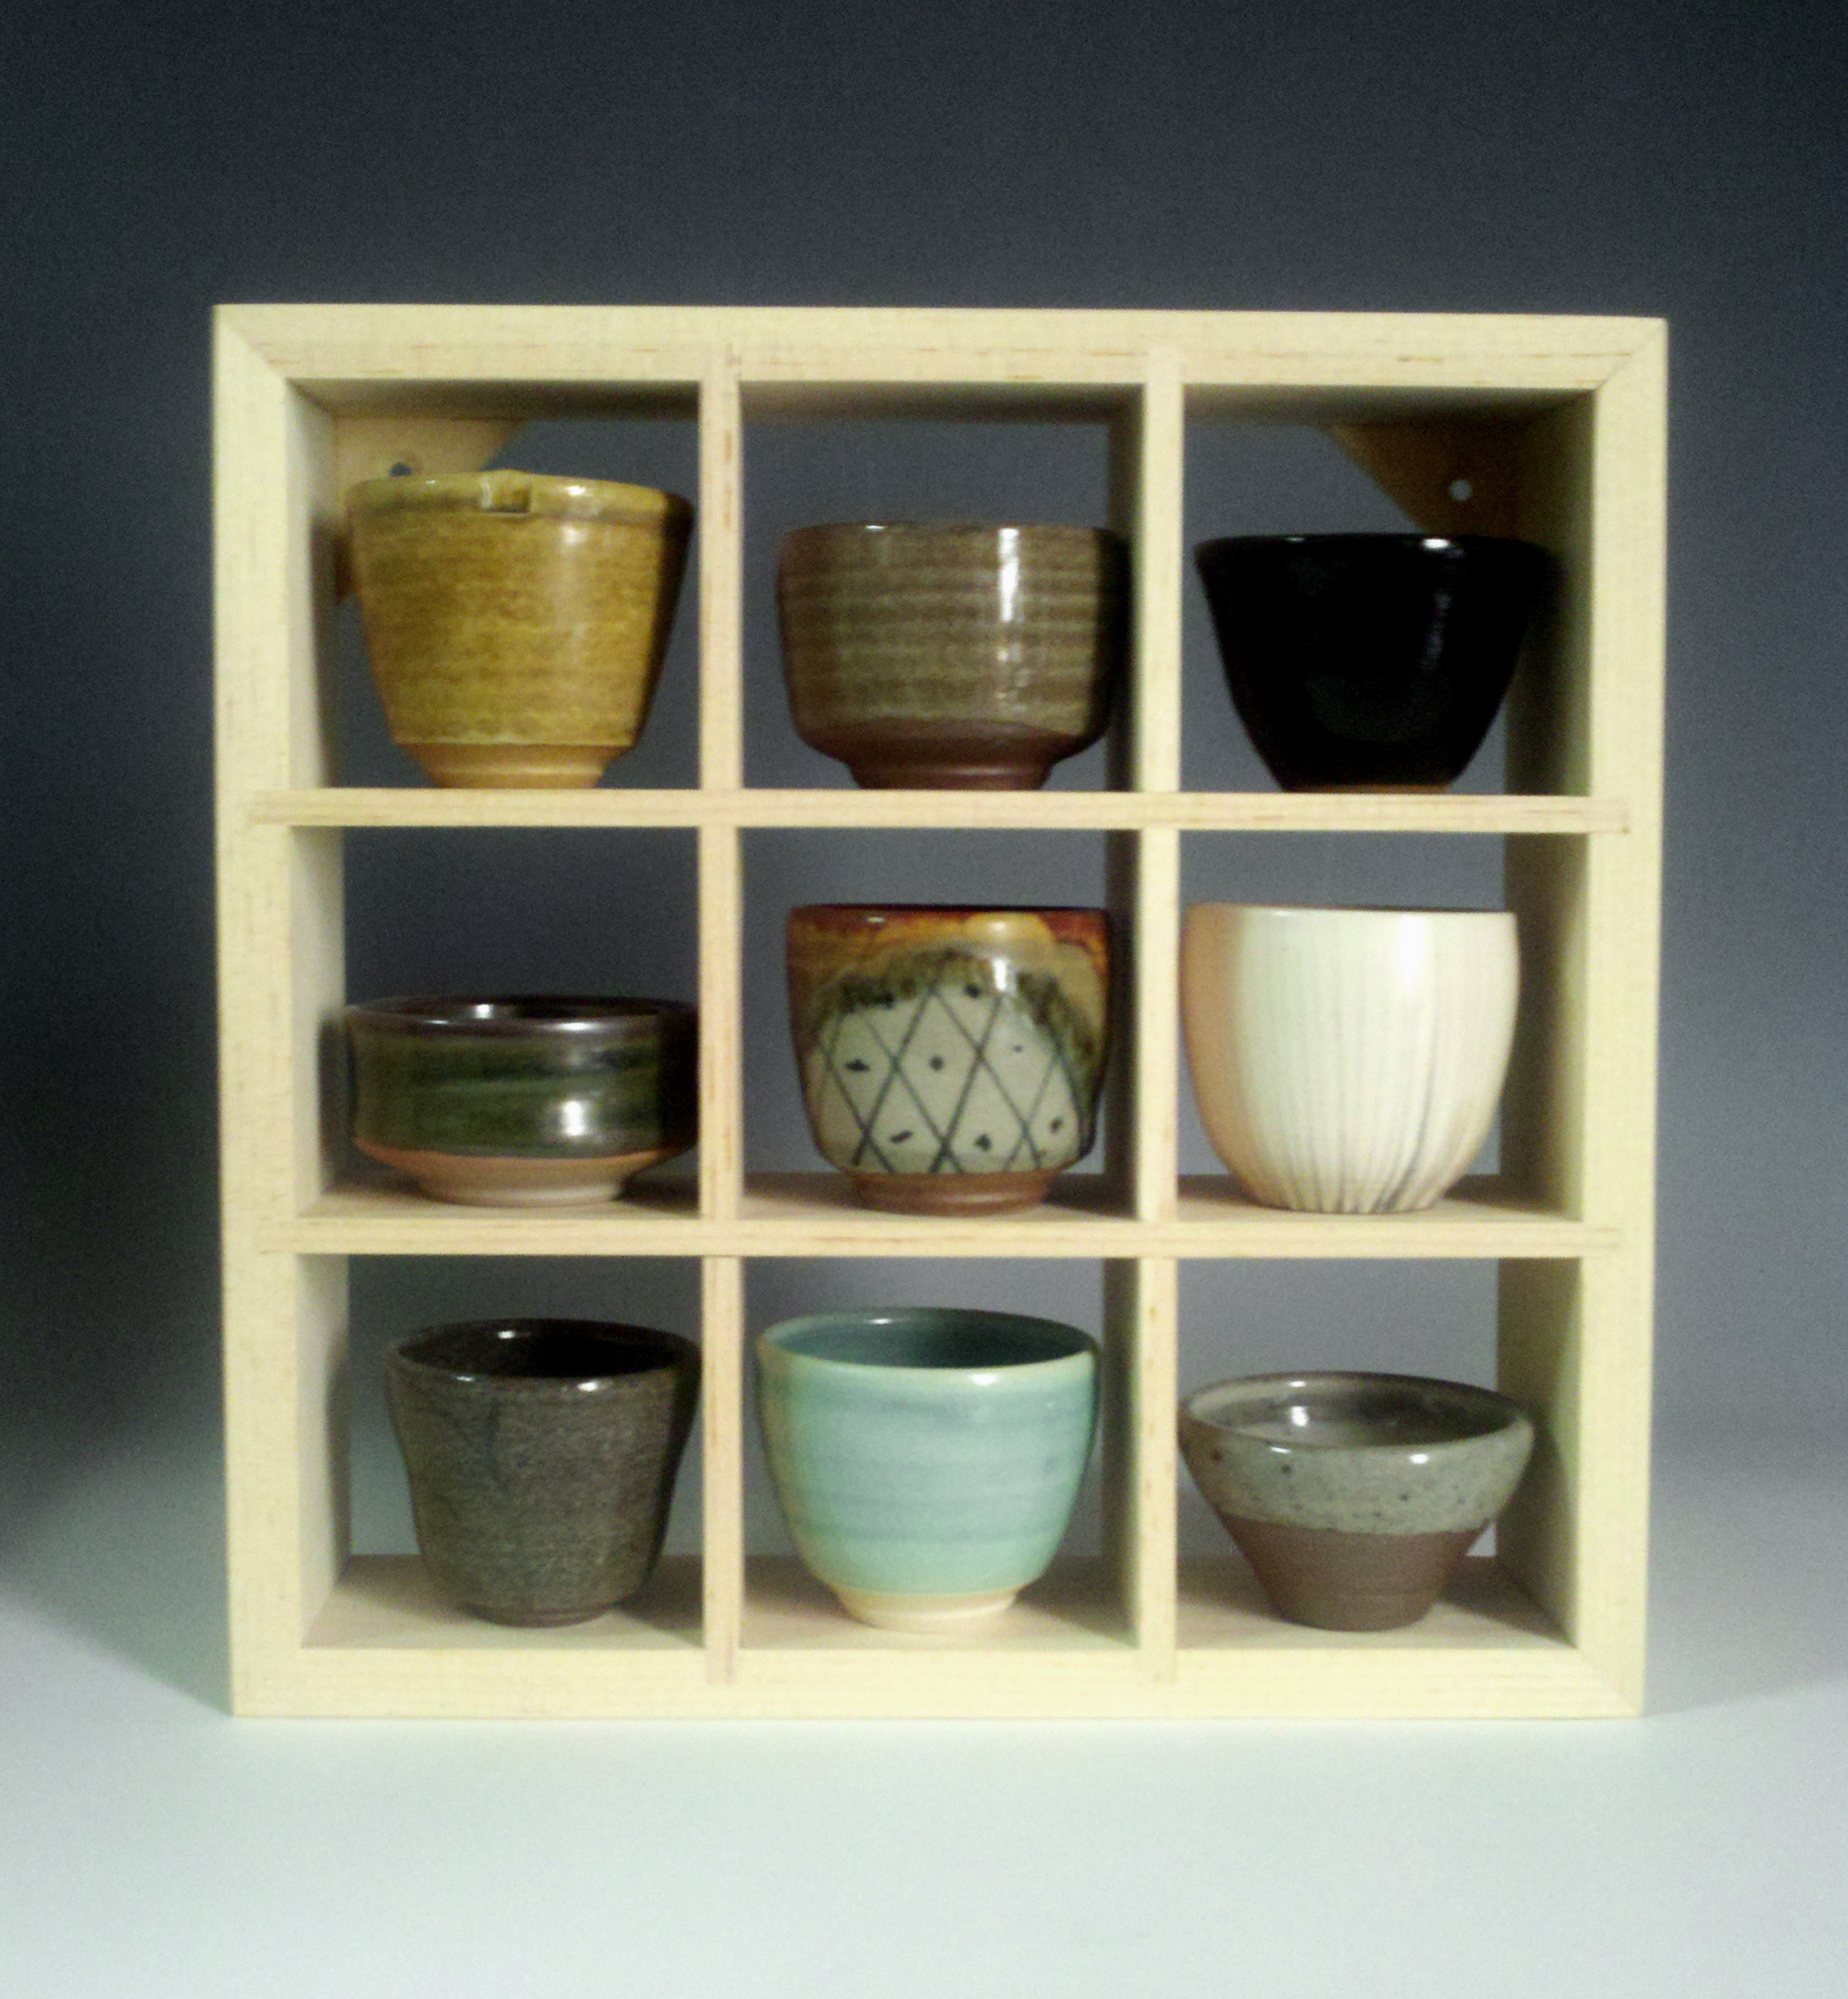 cupism 9 & Ceramic art u2013 Life at Kobo